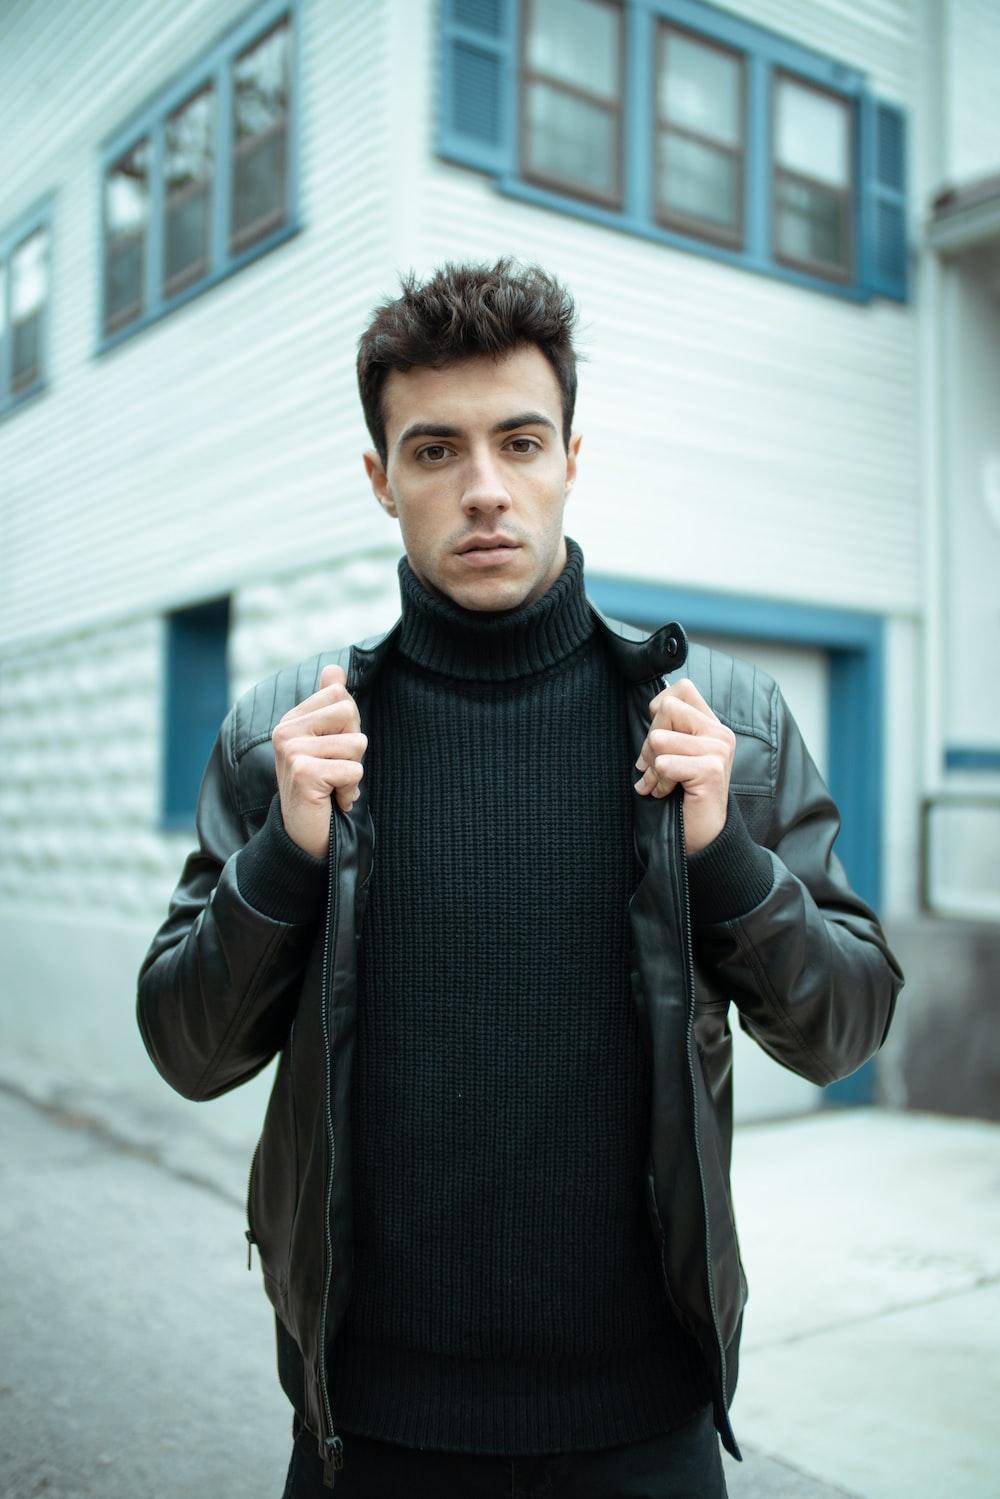 man in black turtleneck sweater and brown jacket